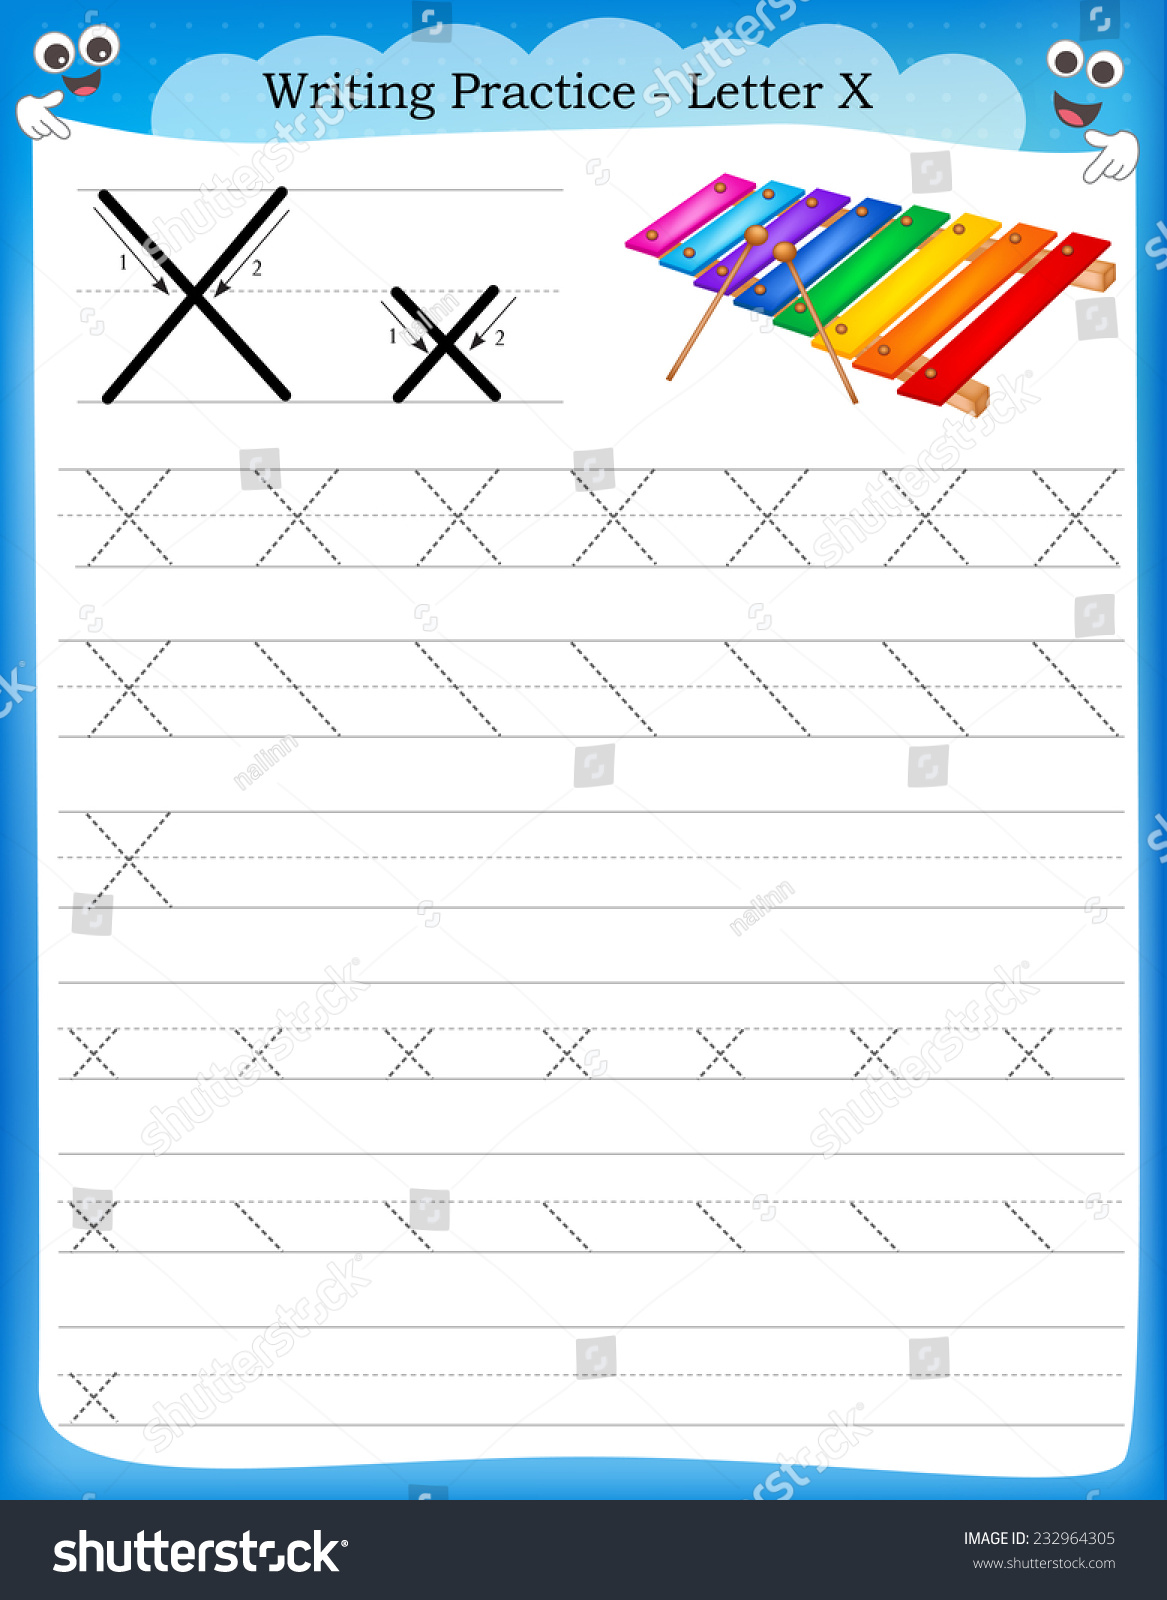 Stock Vector Writing Practice Letter X Printable Worksheet With Clip Art For Preschool Kindergarten Kids To on Stock Illustration Writing Practice Letter P Printable Worksheet Clip